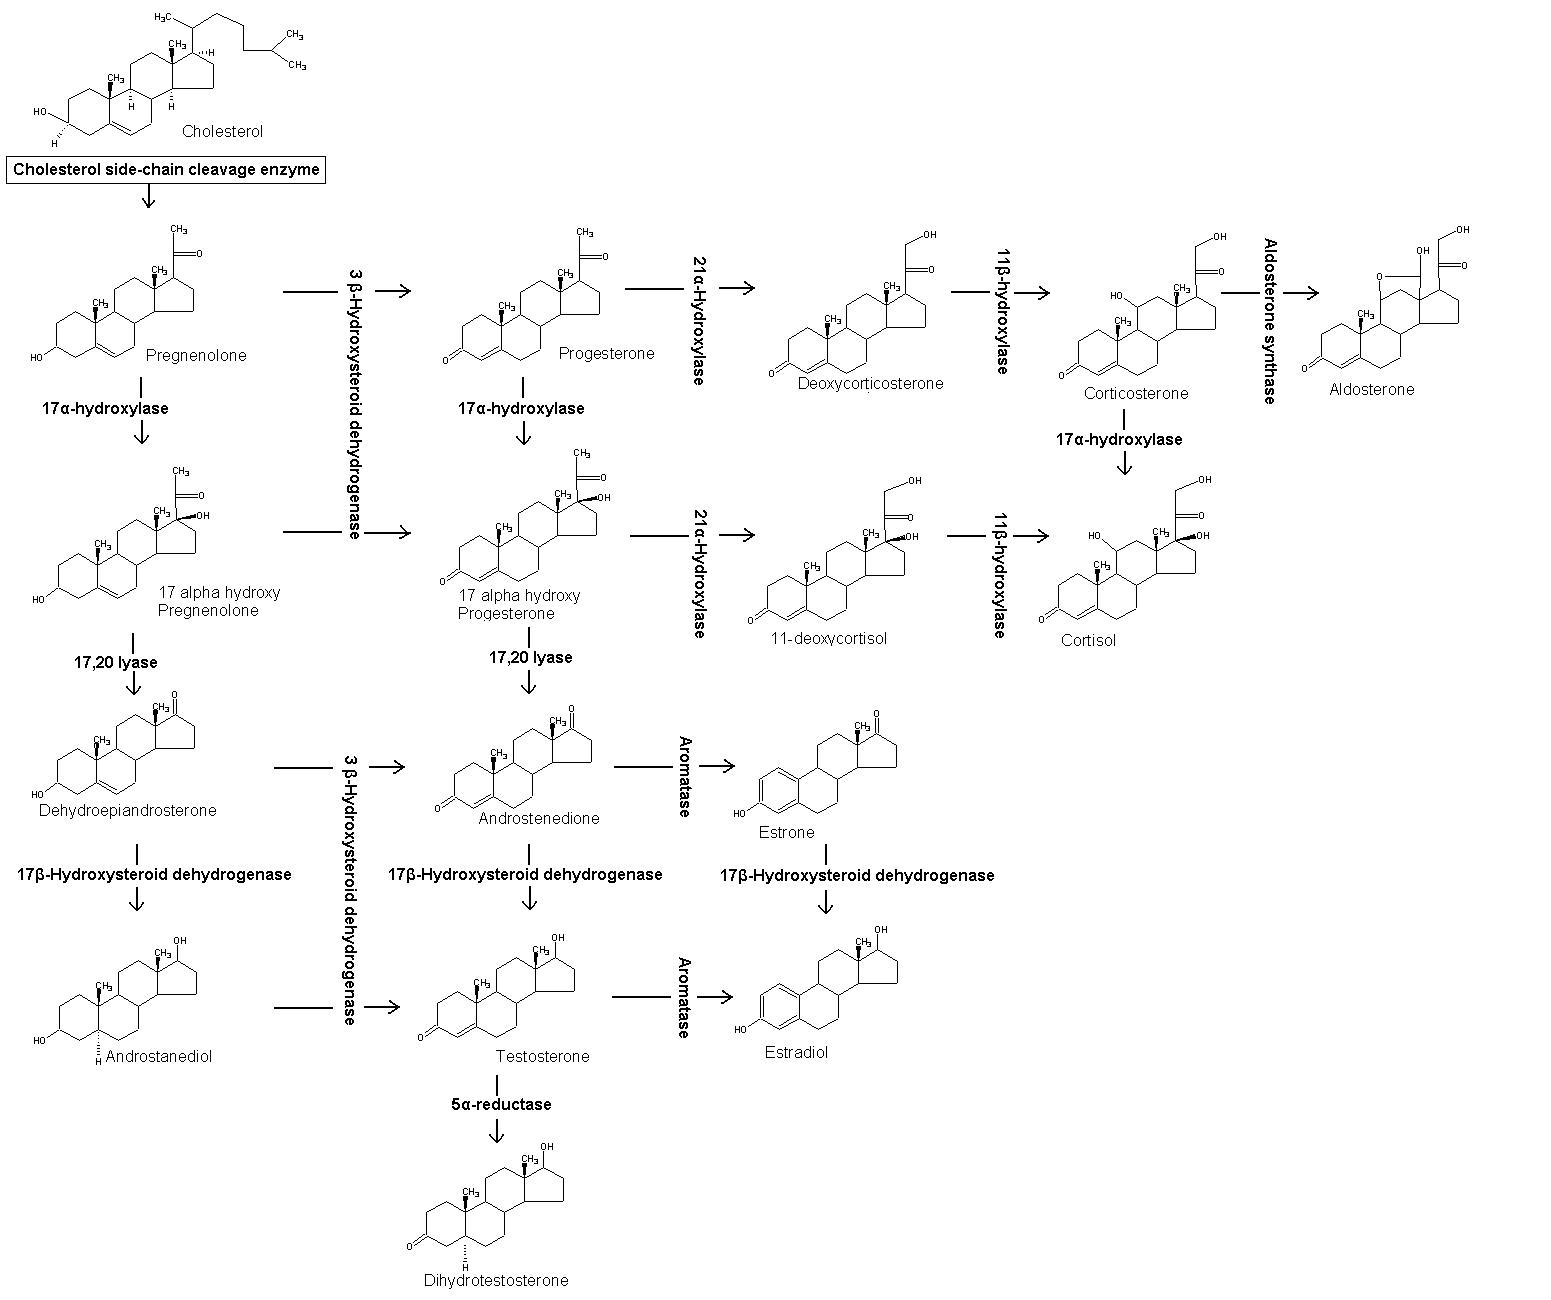 File:Steroidogenesis November 2007.png - Wikimedia Commons